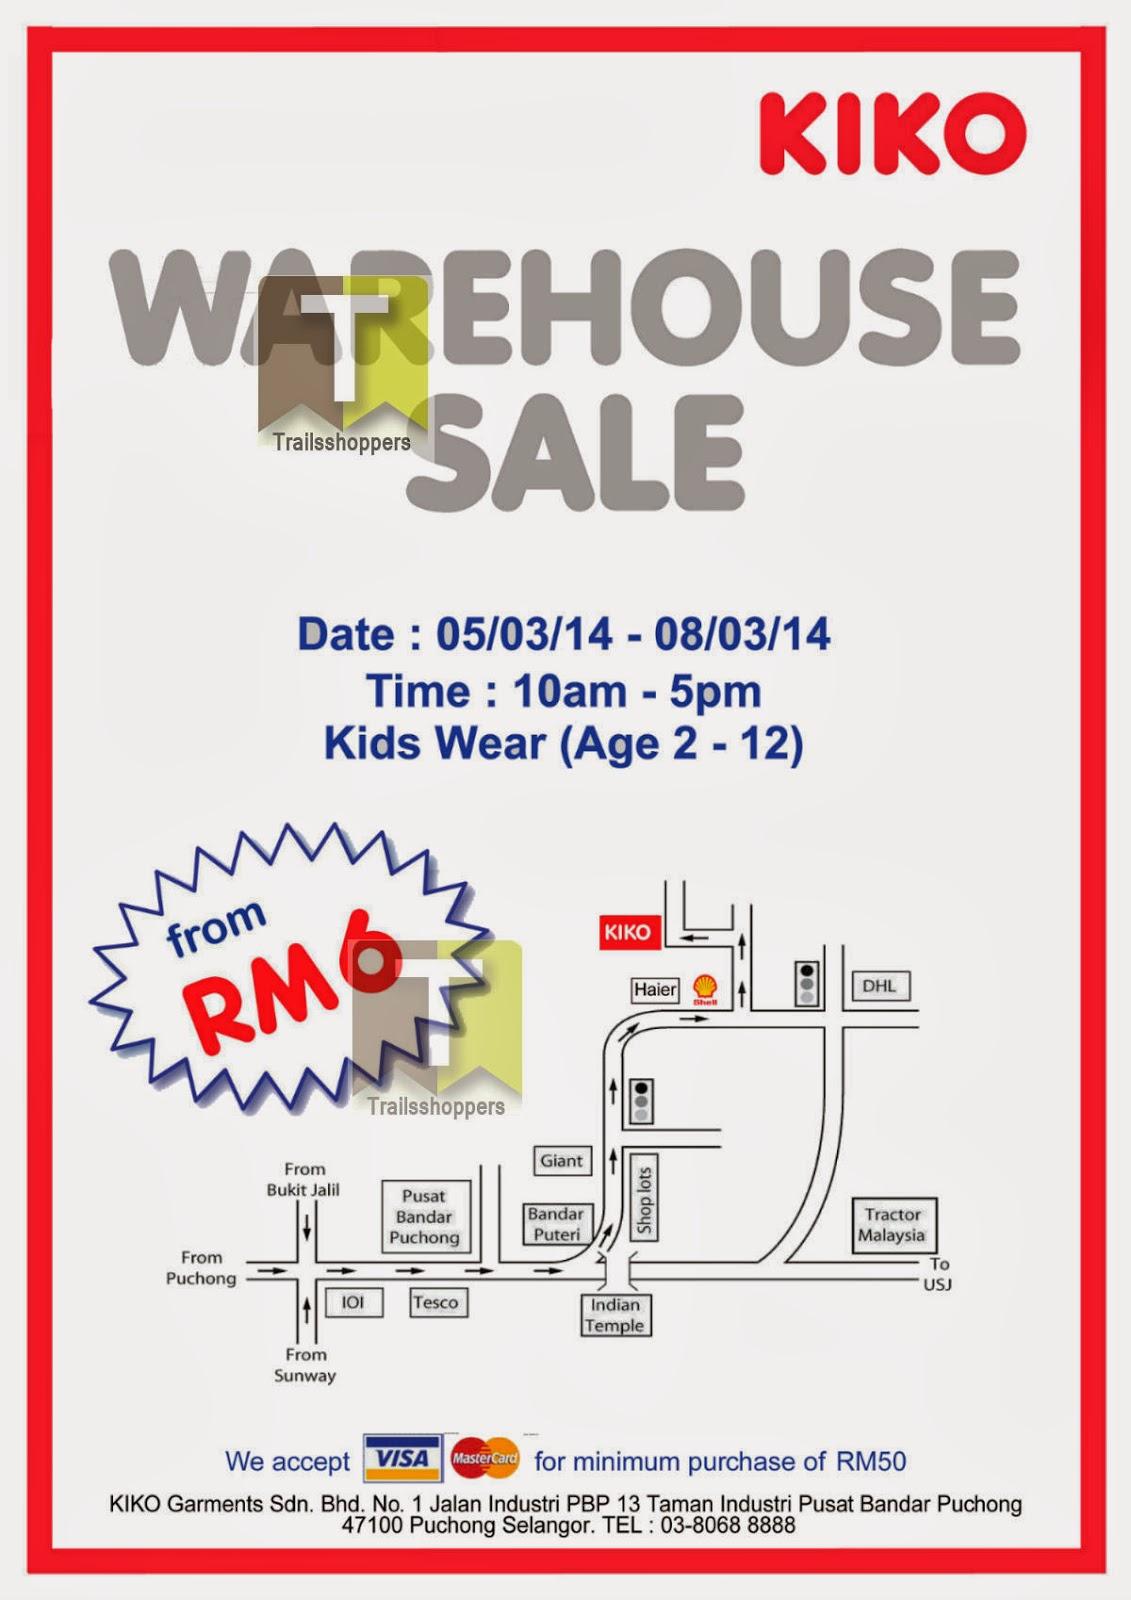 Kiko Warehouse Sale Puchong Selangor